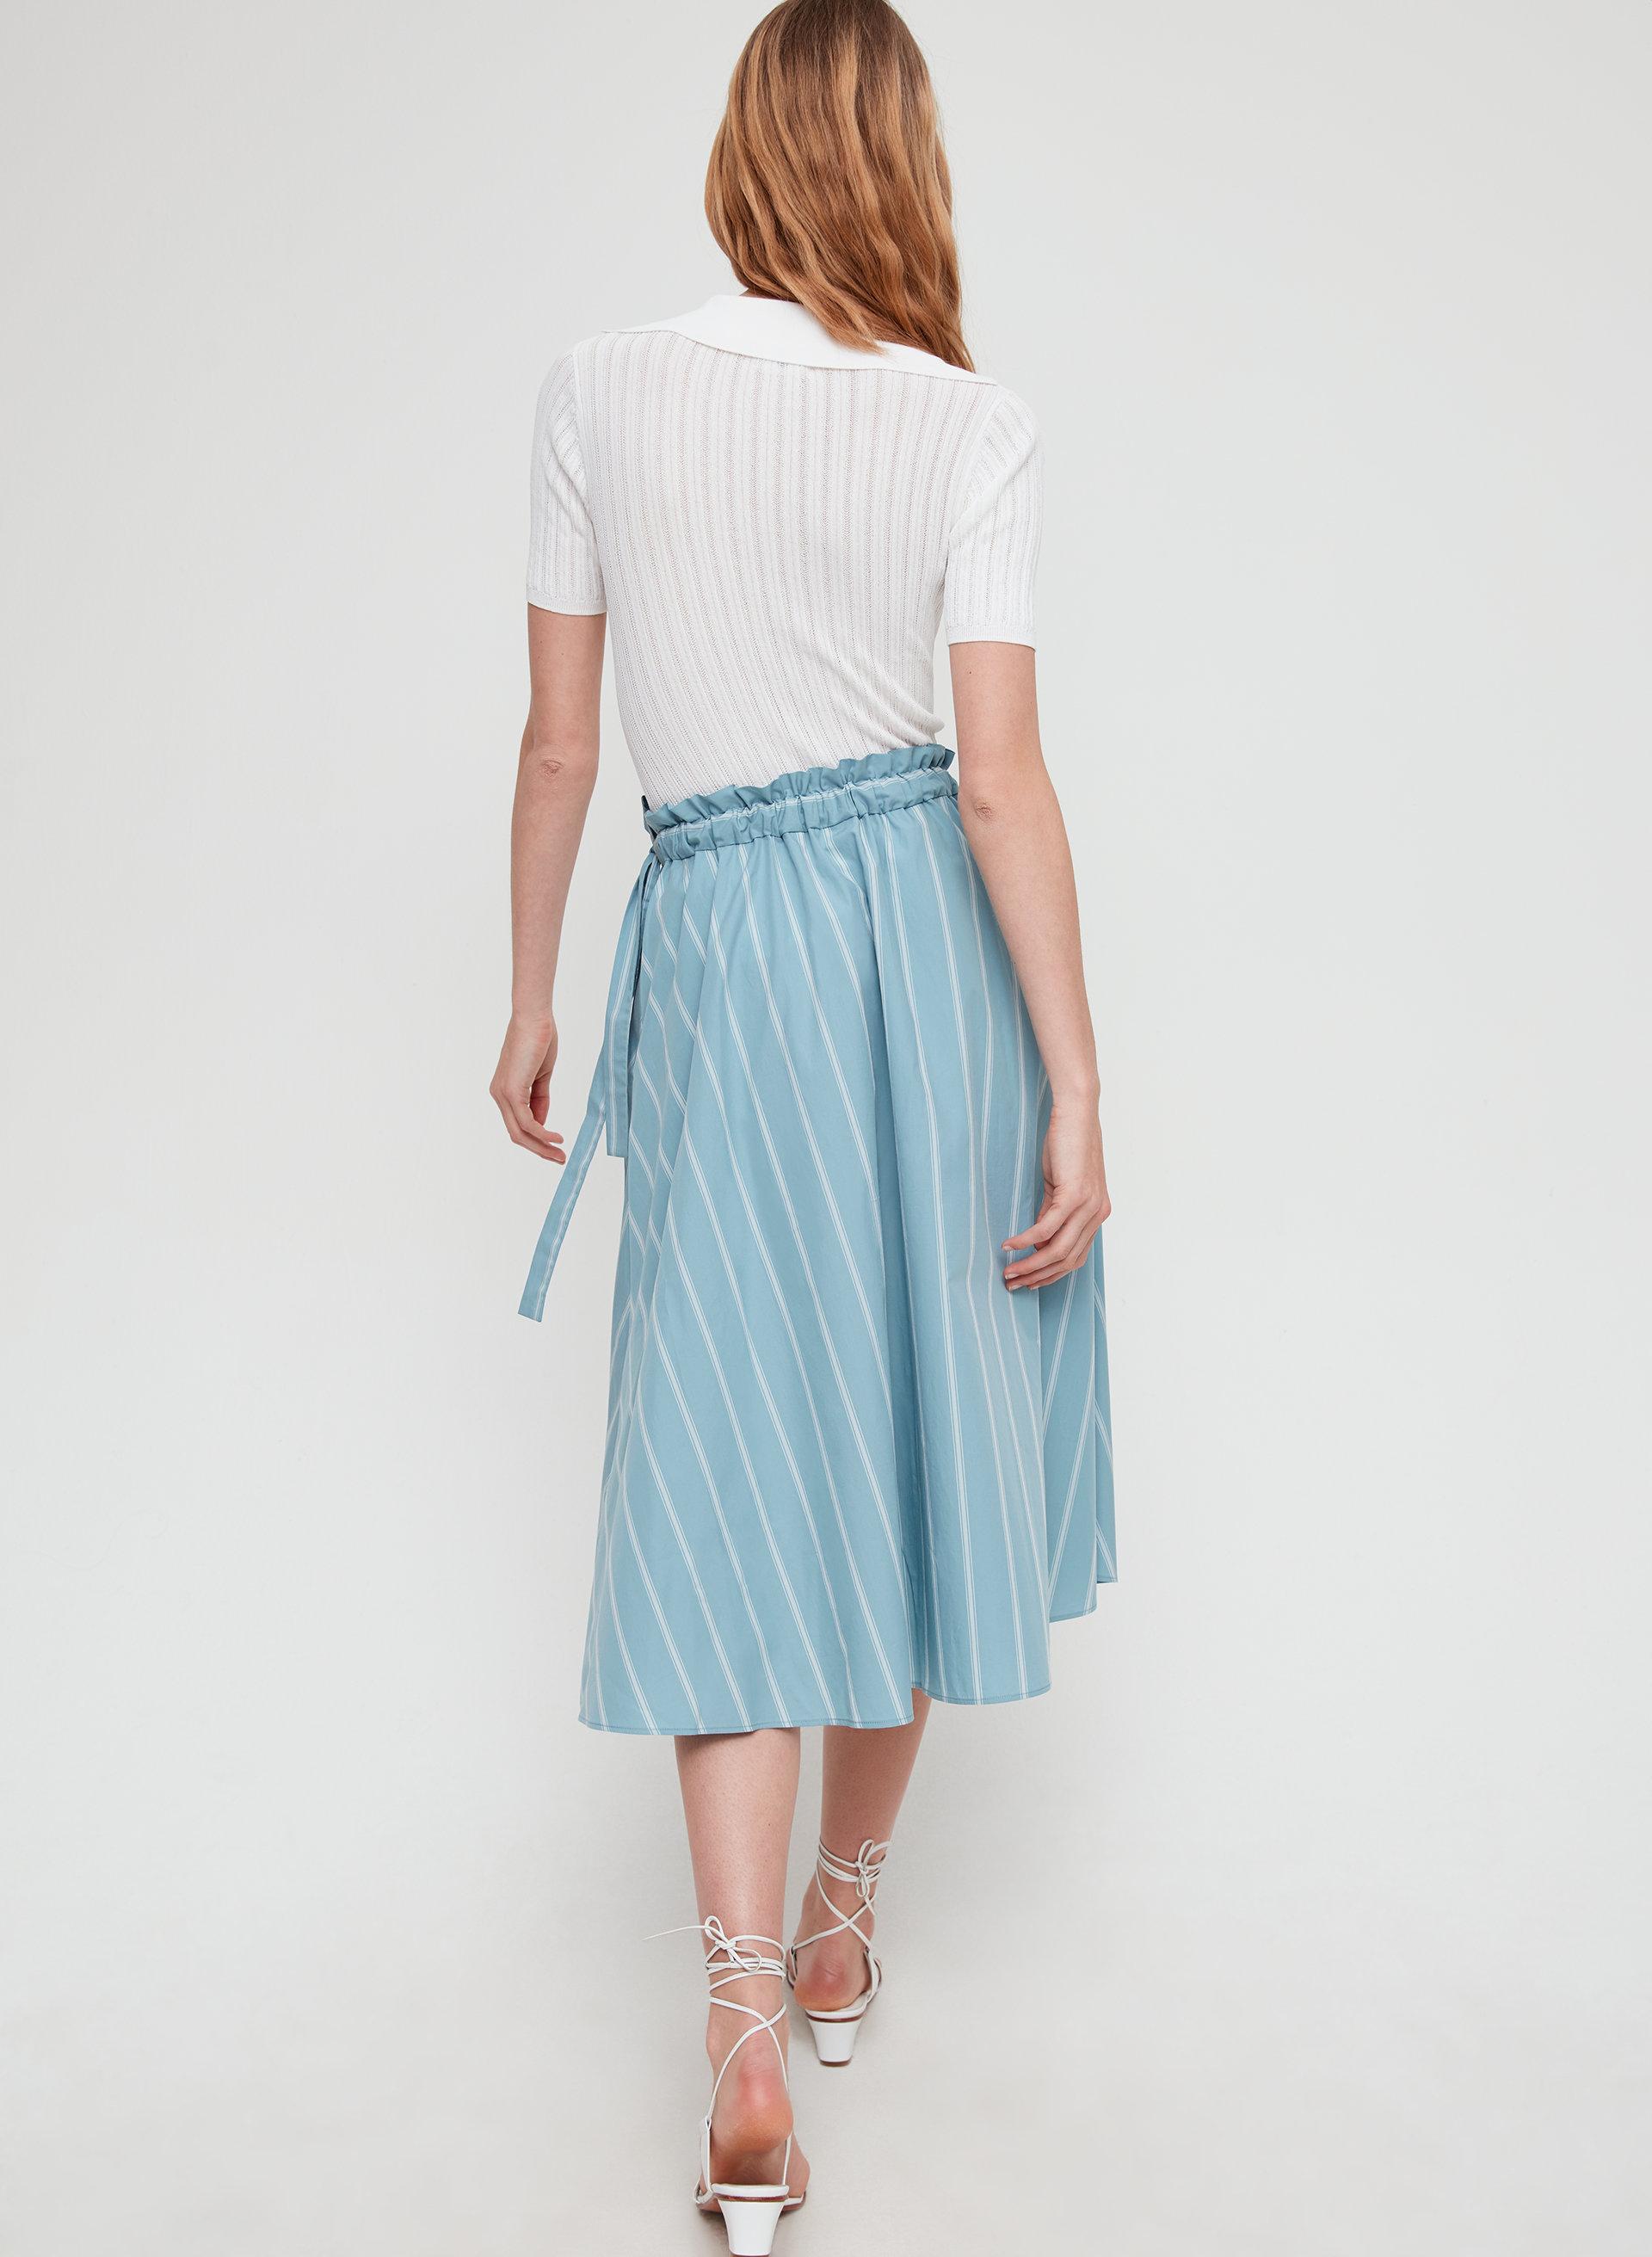 1393421bd CHAMBLY SKIRT - Striped, A-line midi skirt